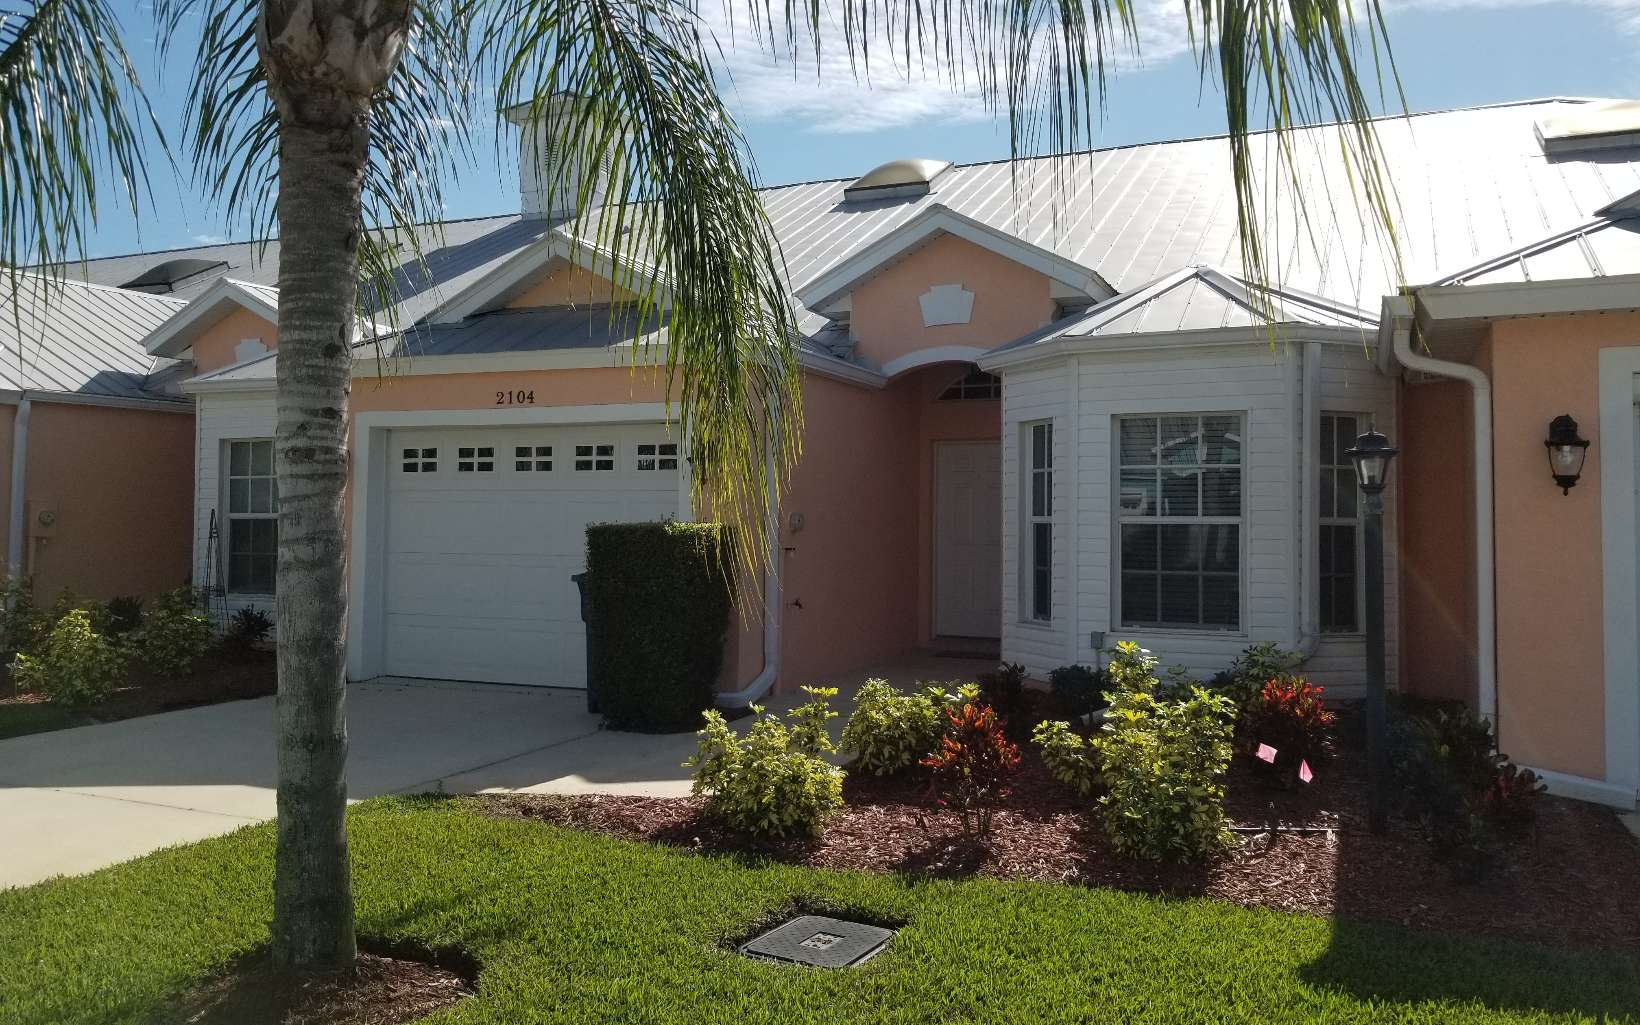 2104 Coral Key Ct, Sebring, FL 33870